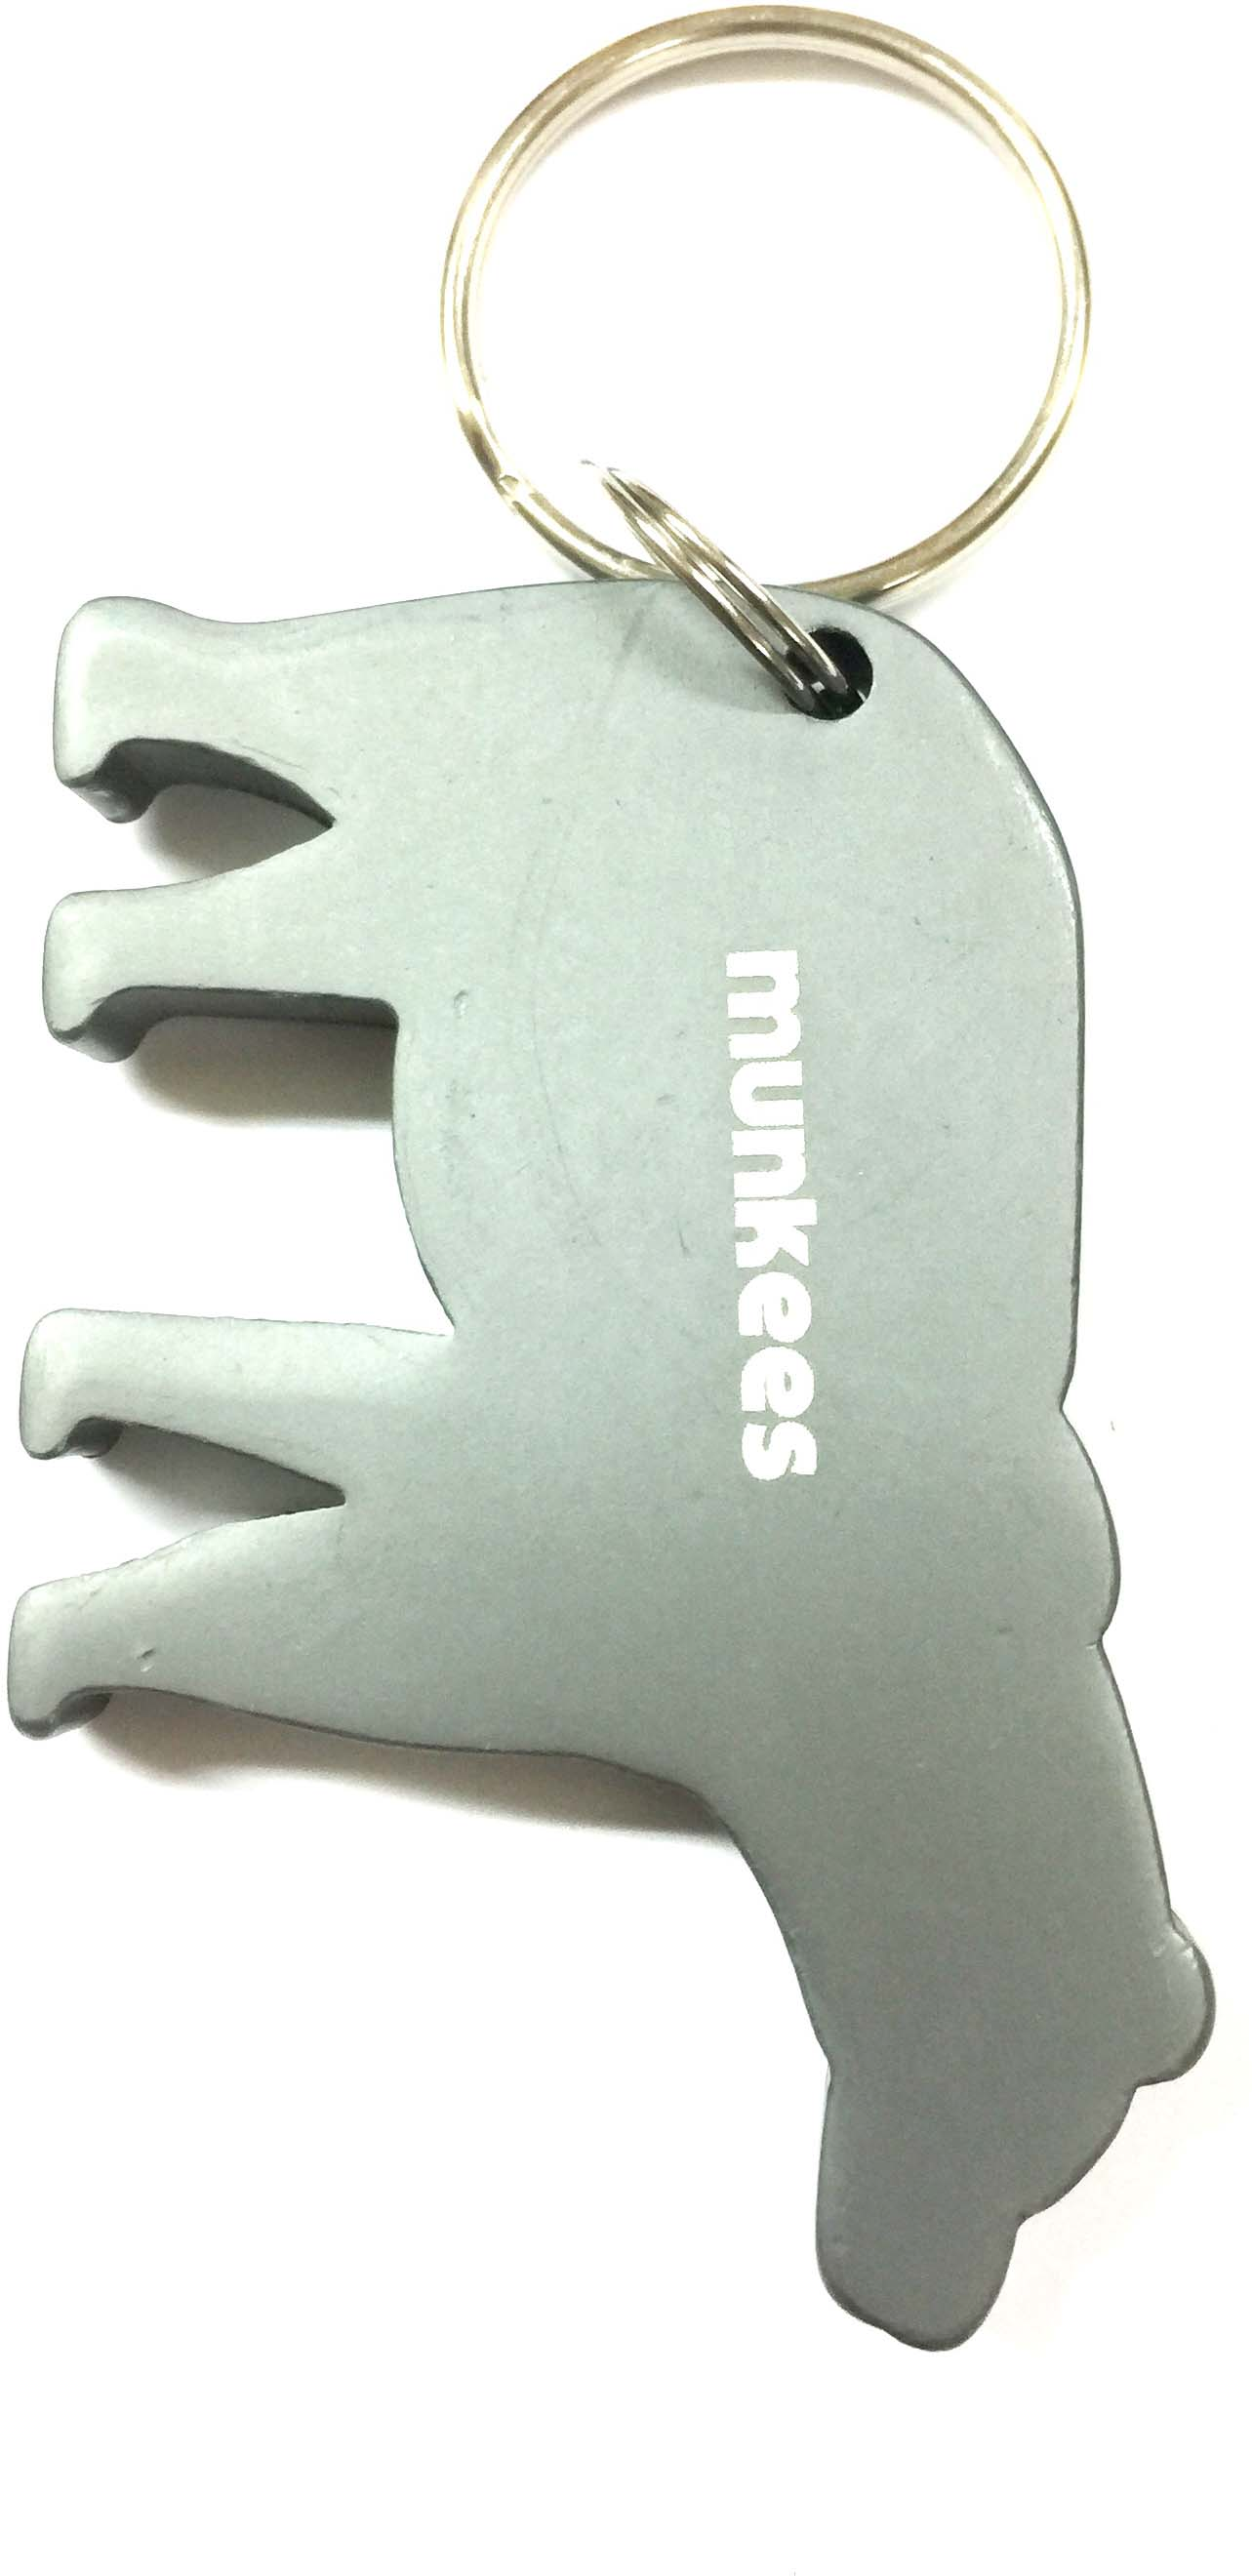 Брелок-открывалка Munkees Медведь, цвет: серый брелок открывалка munkees стандартная цвет желтый